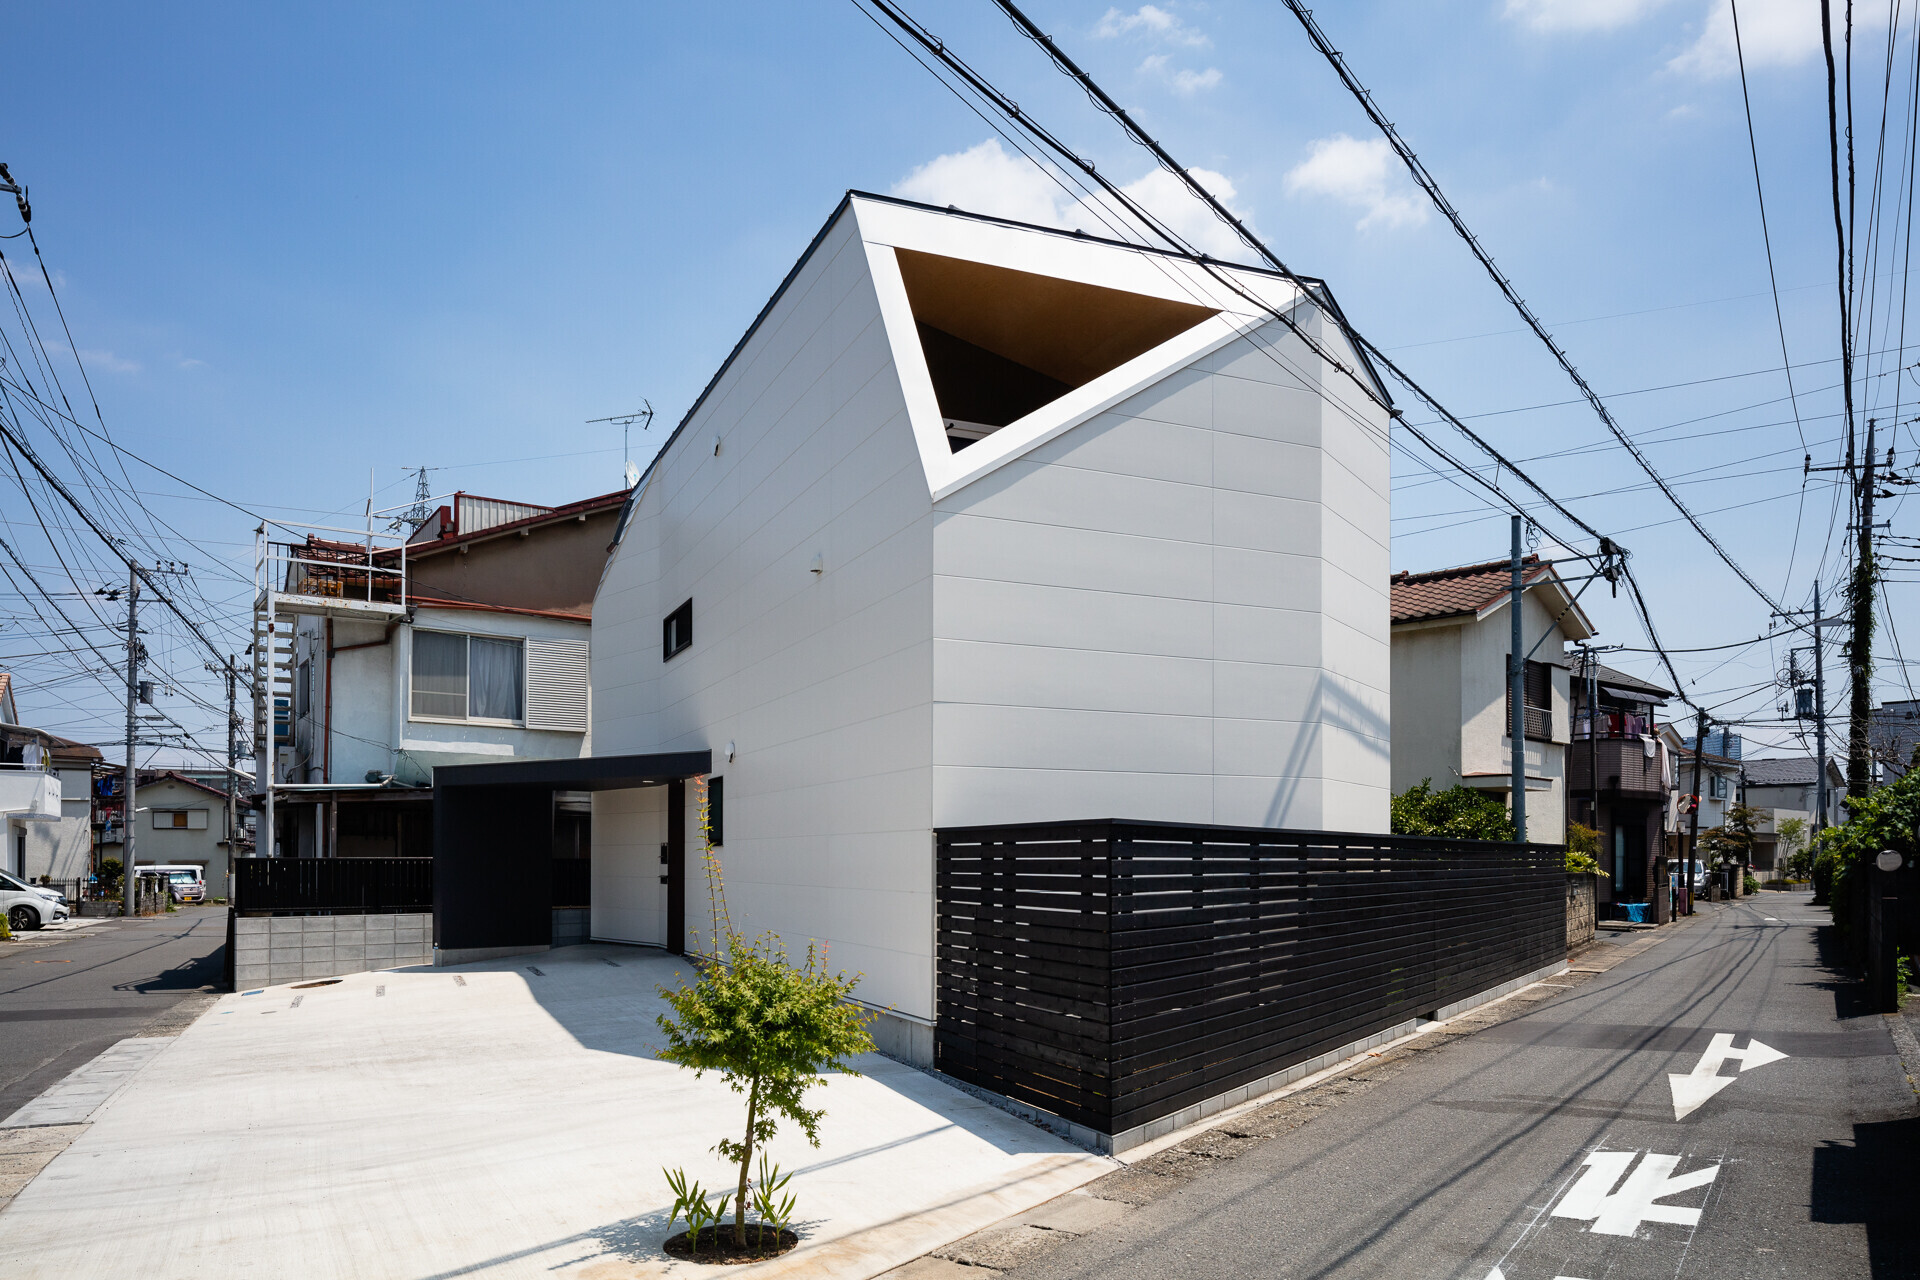 photo by大沢誠一   ミカンの木の育つ二世帯住宅